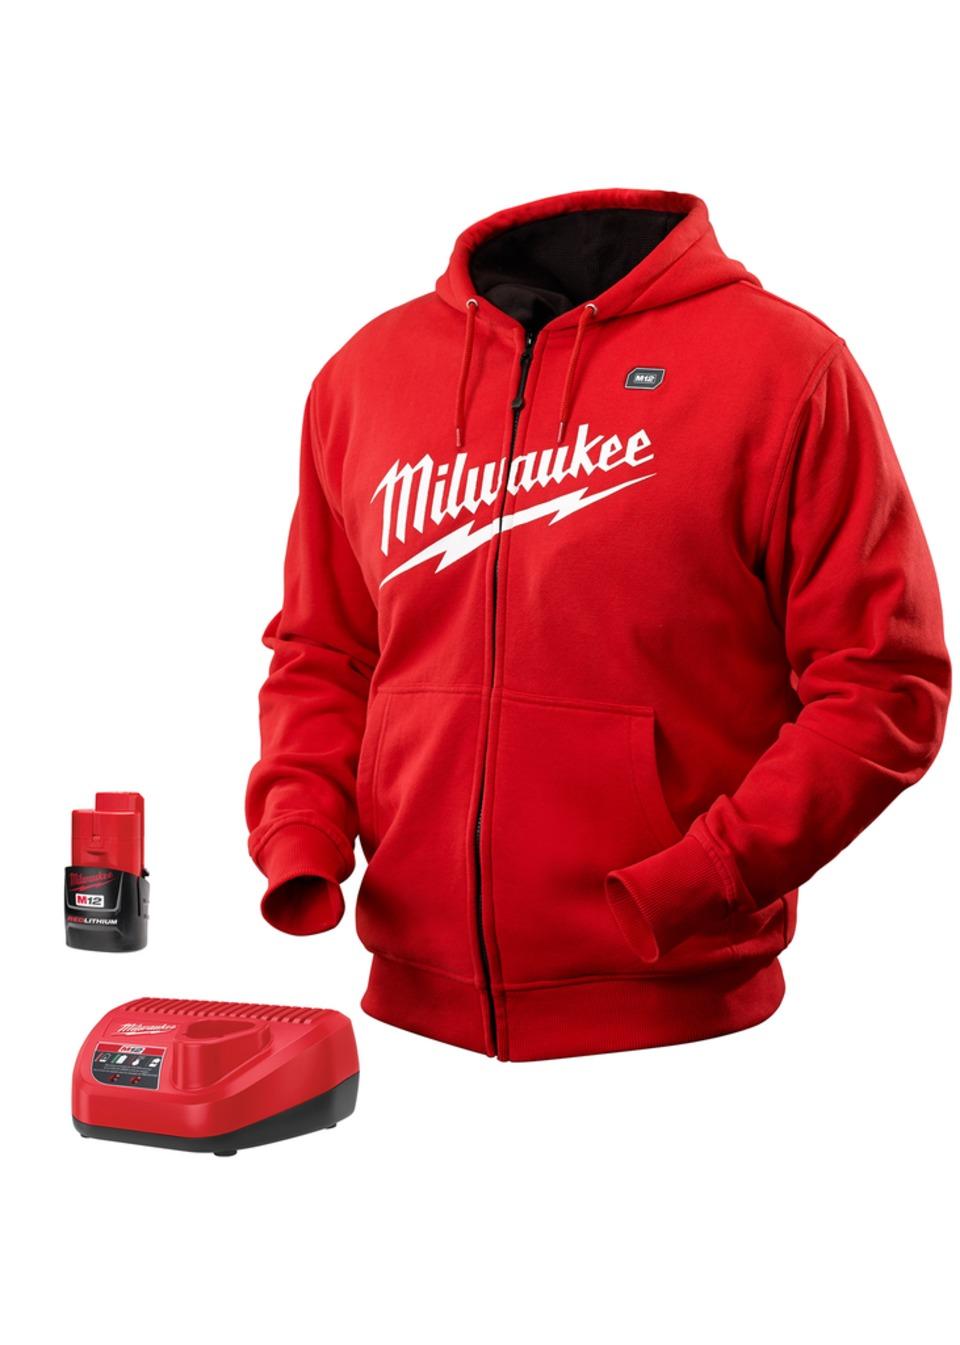 Where to buy milwaukee heated jacket